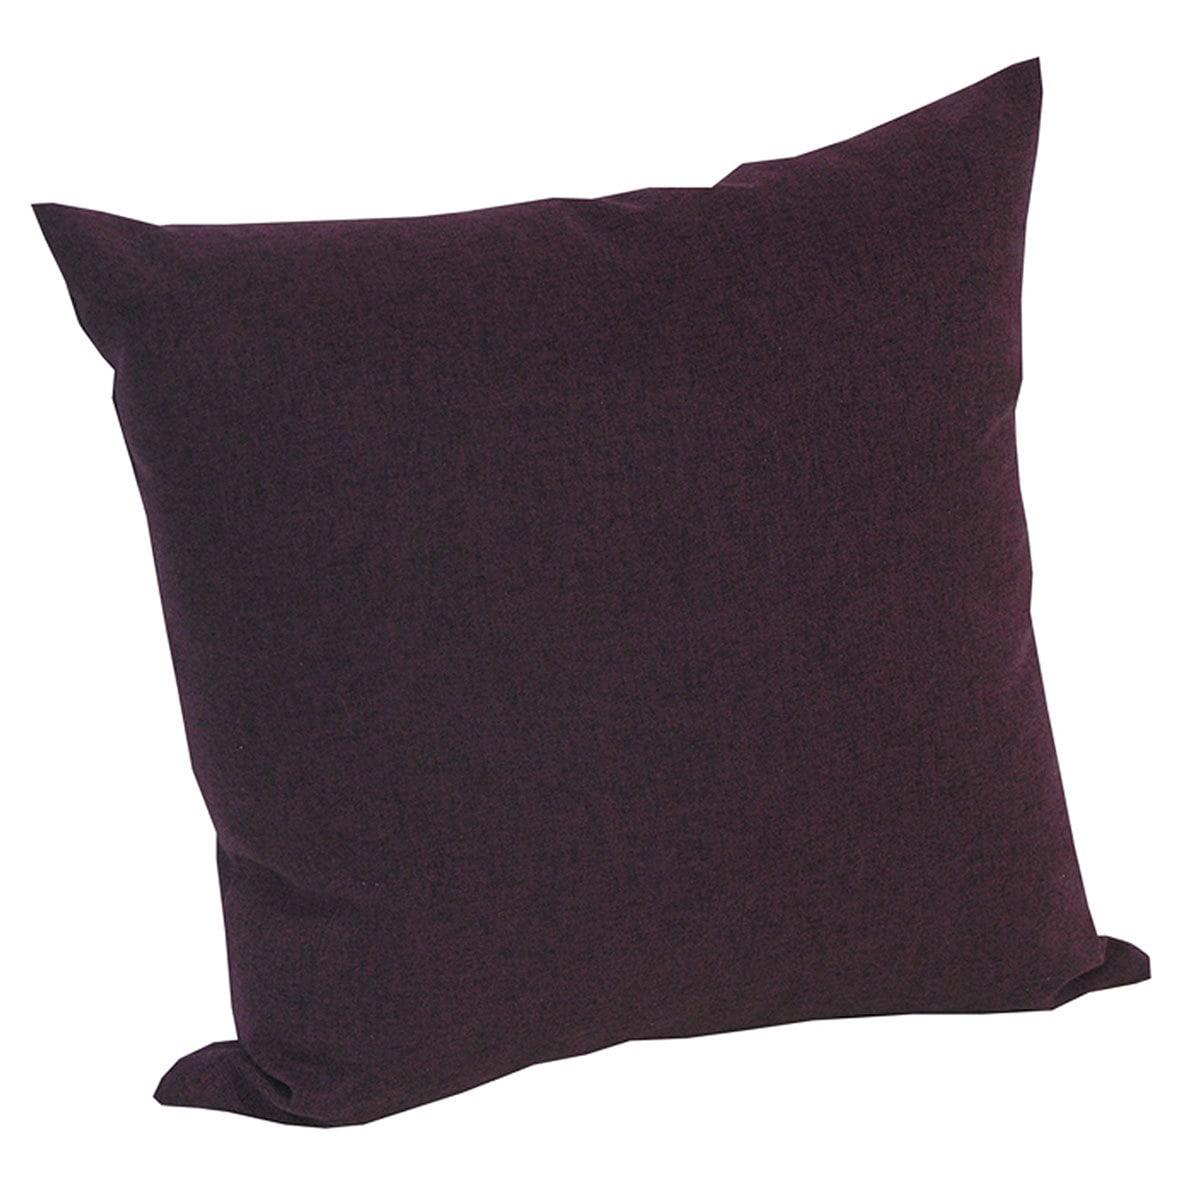 sun garden kissenh lle sunday g nstig online kaufen bei bettwaren shop. Black Bedroom Furniture Sets. Home Design Ideas